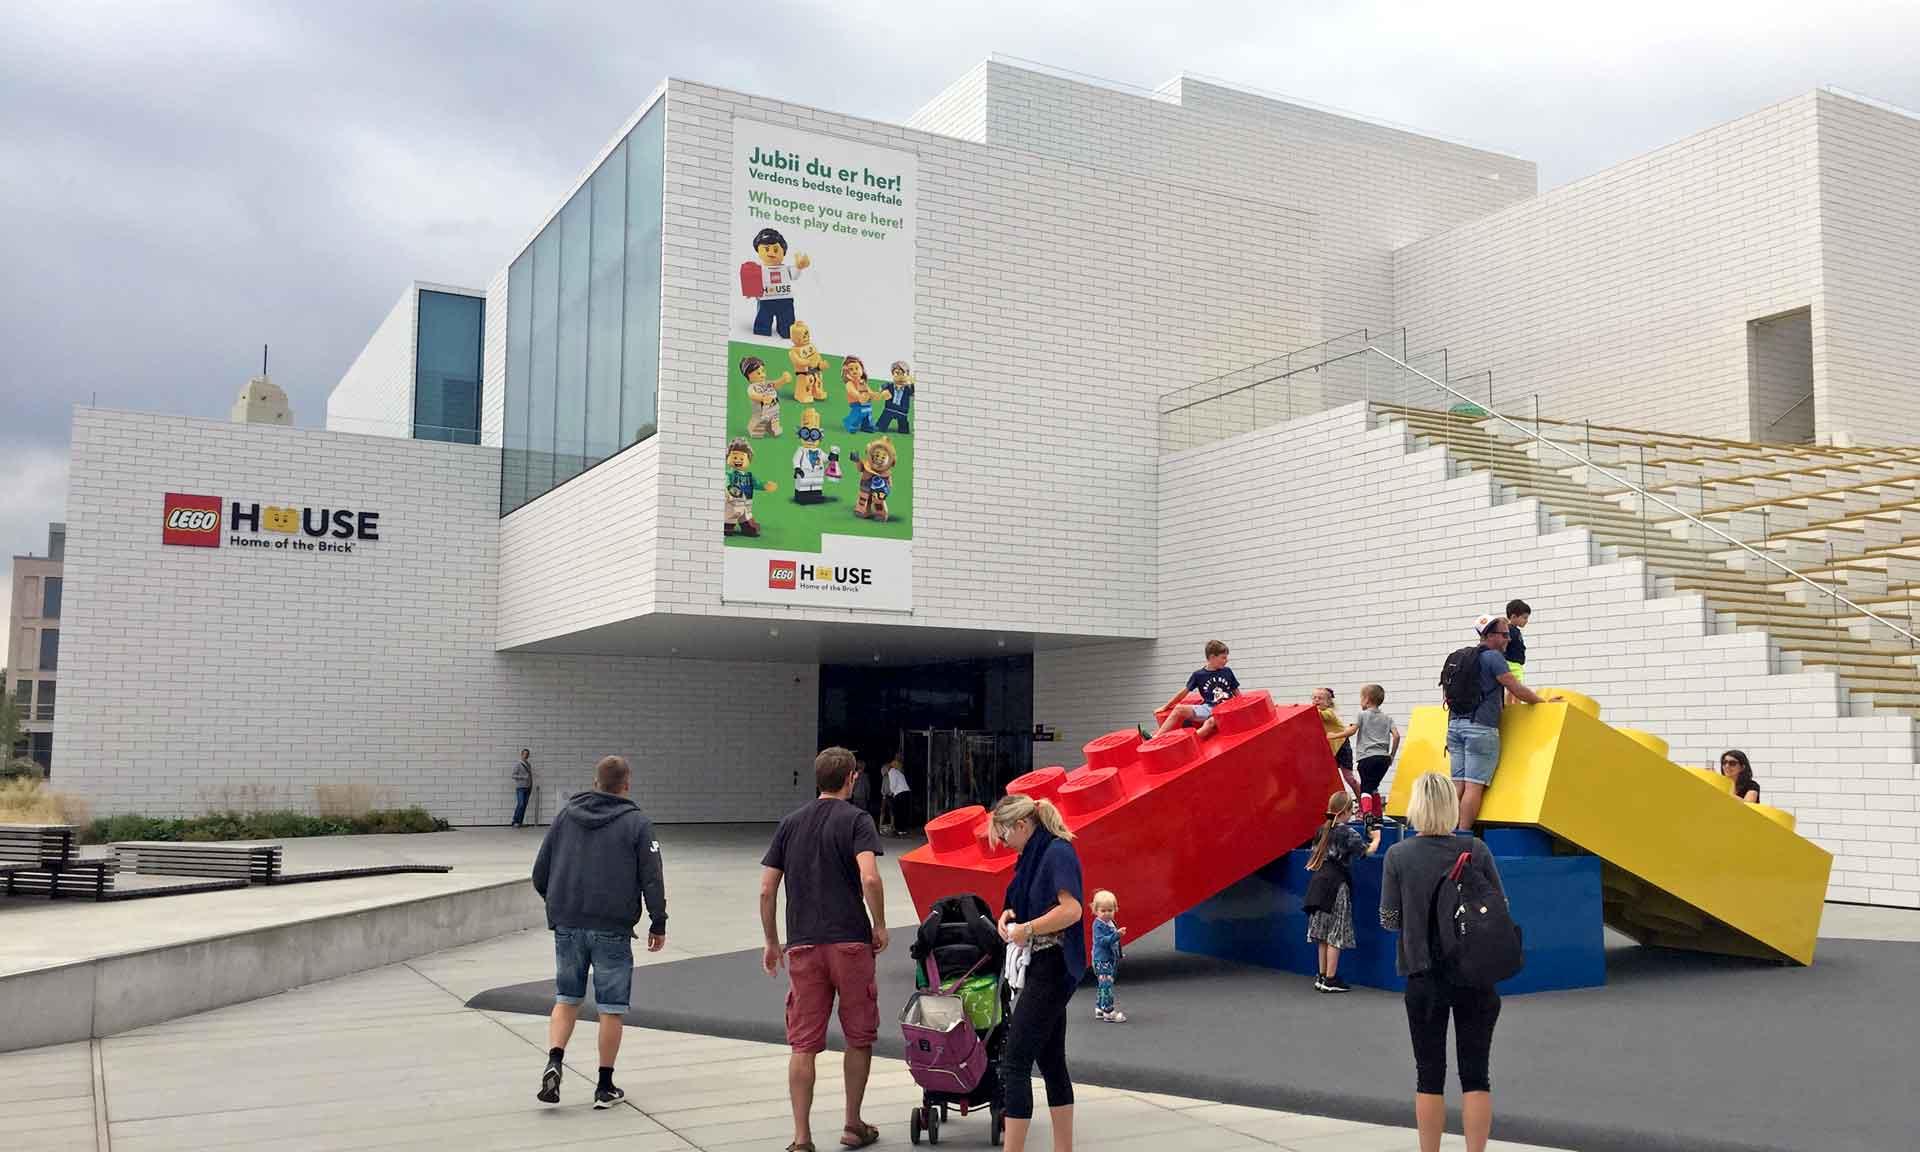 LEGO House exterior